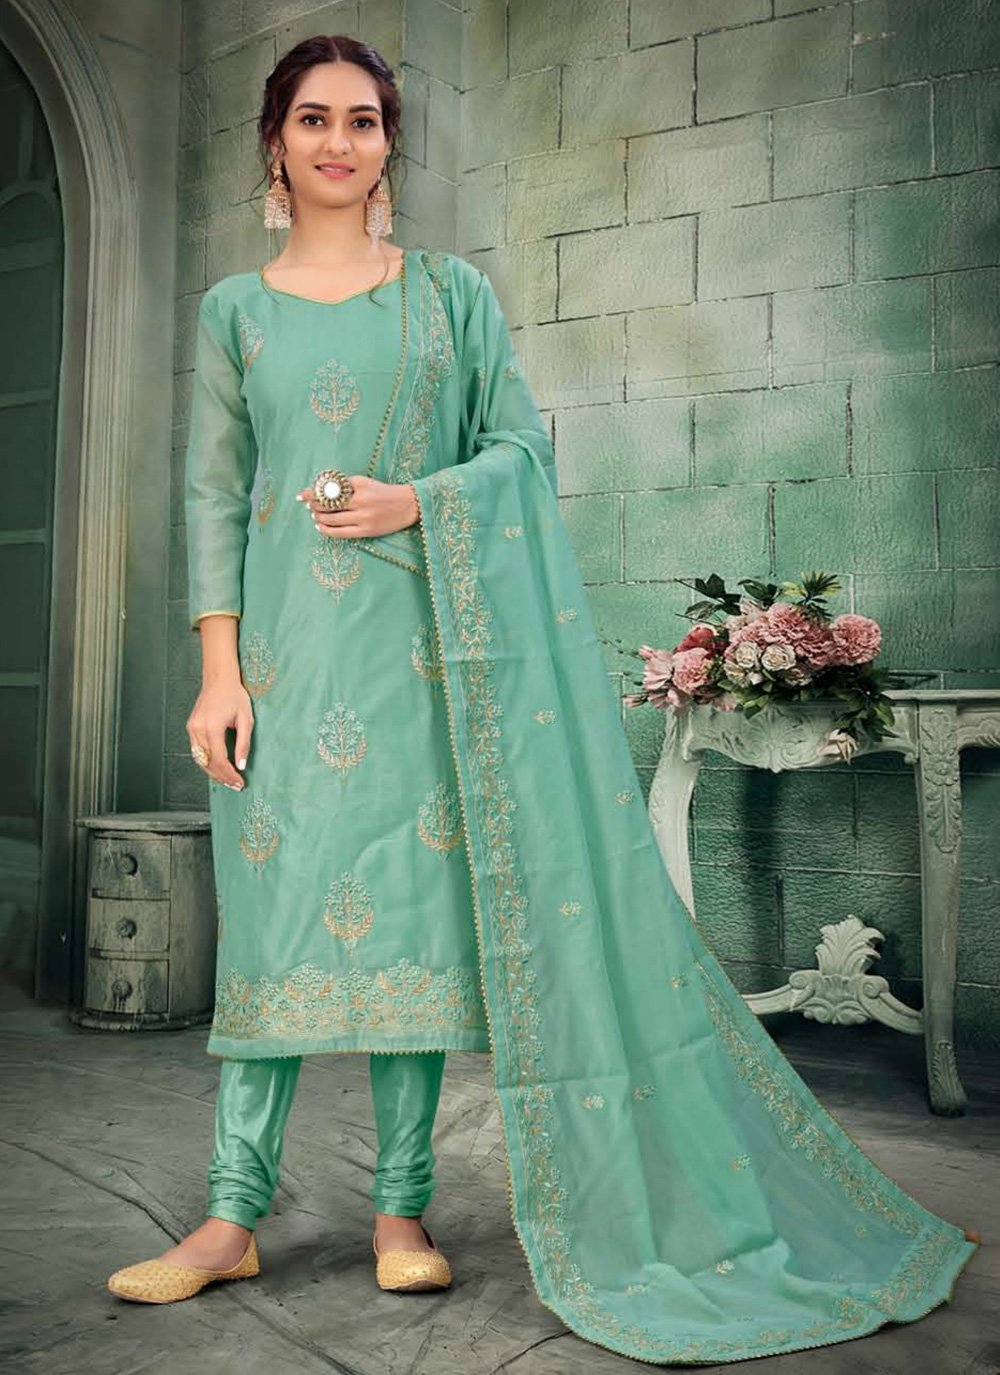 Green Embroidered Churidar Salwar Kameez